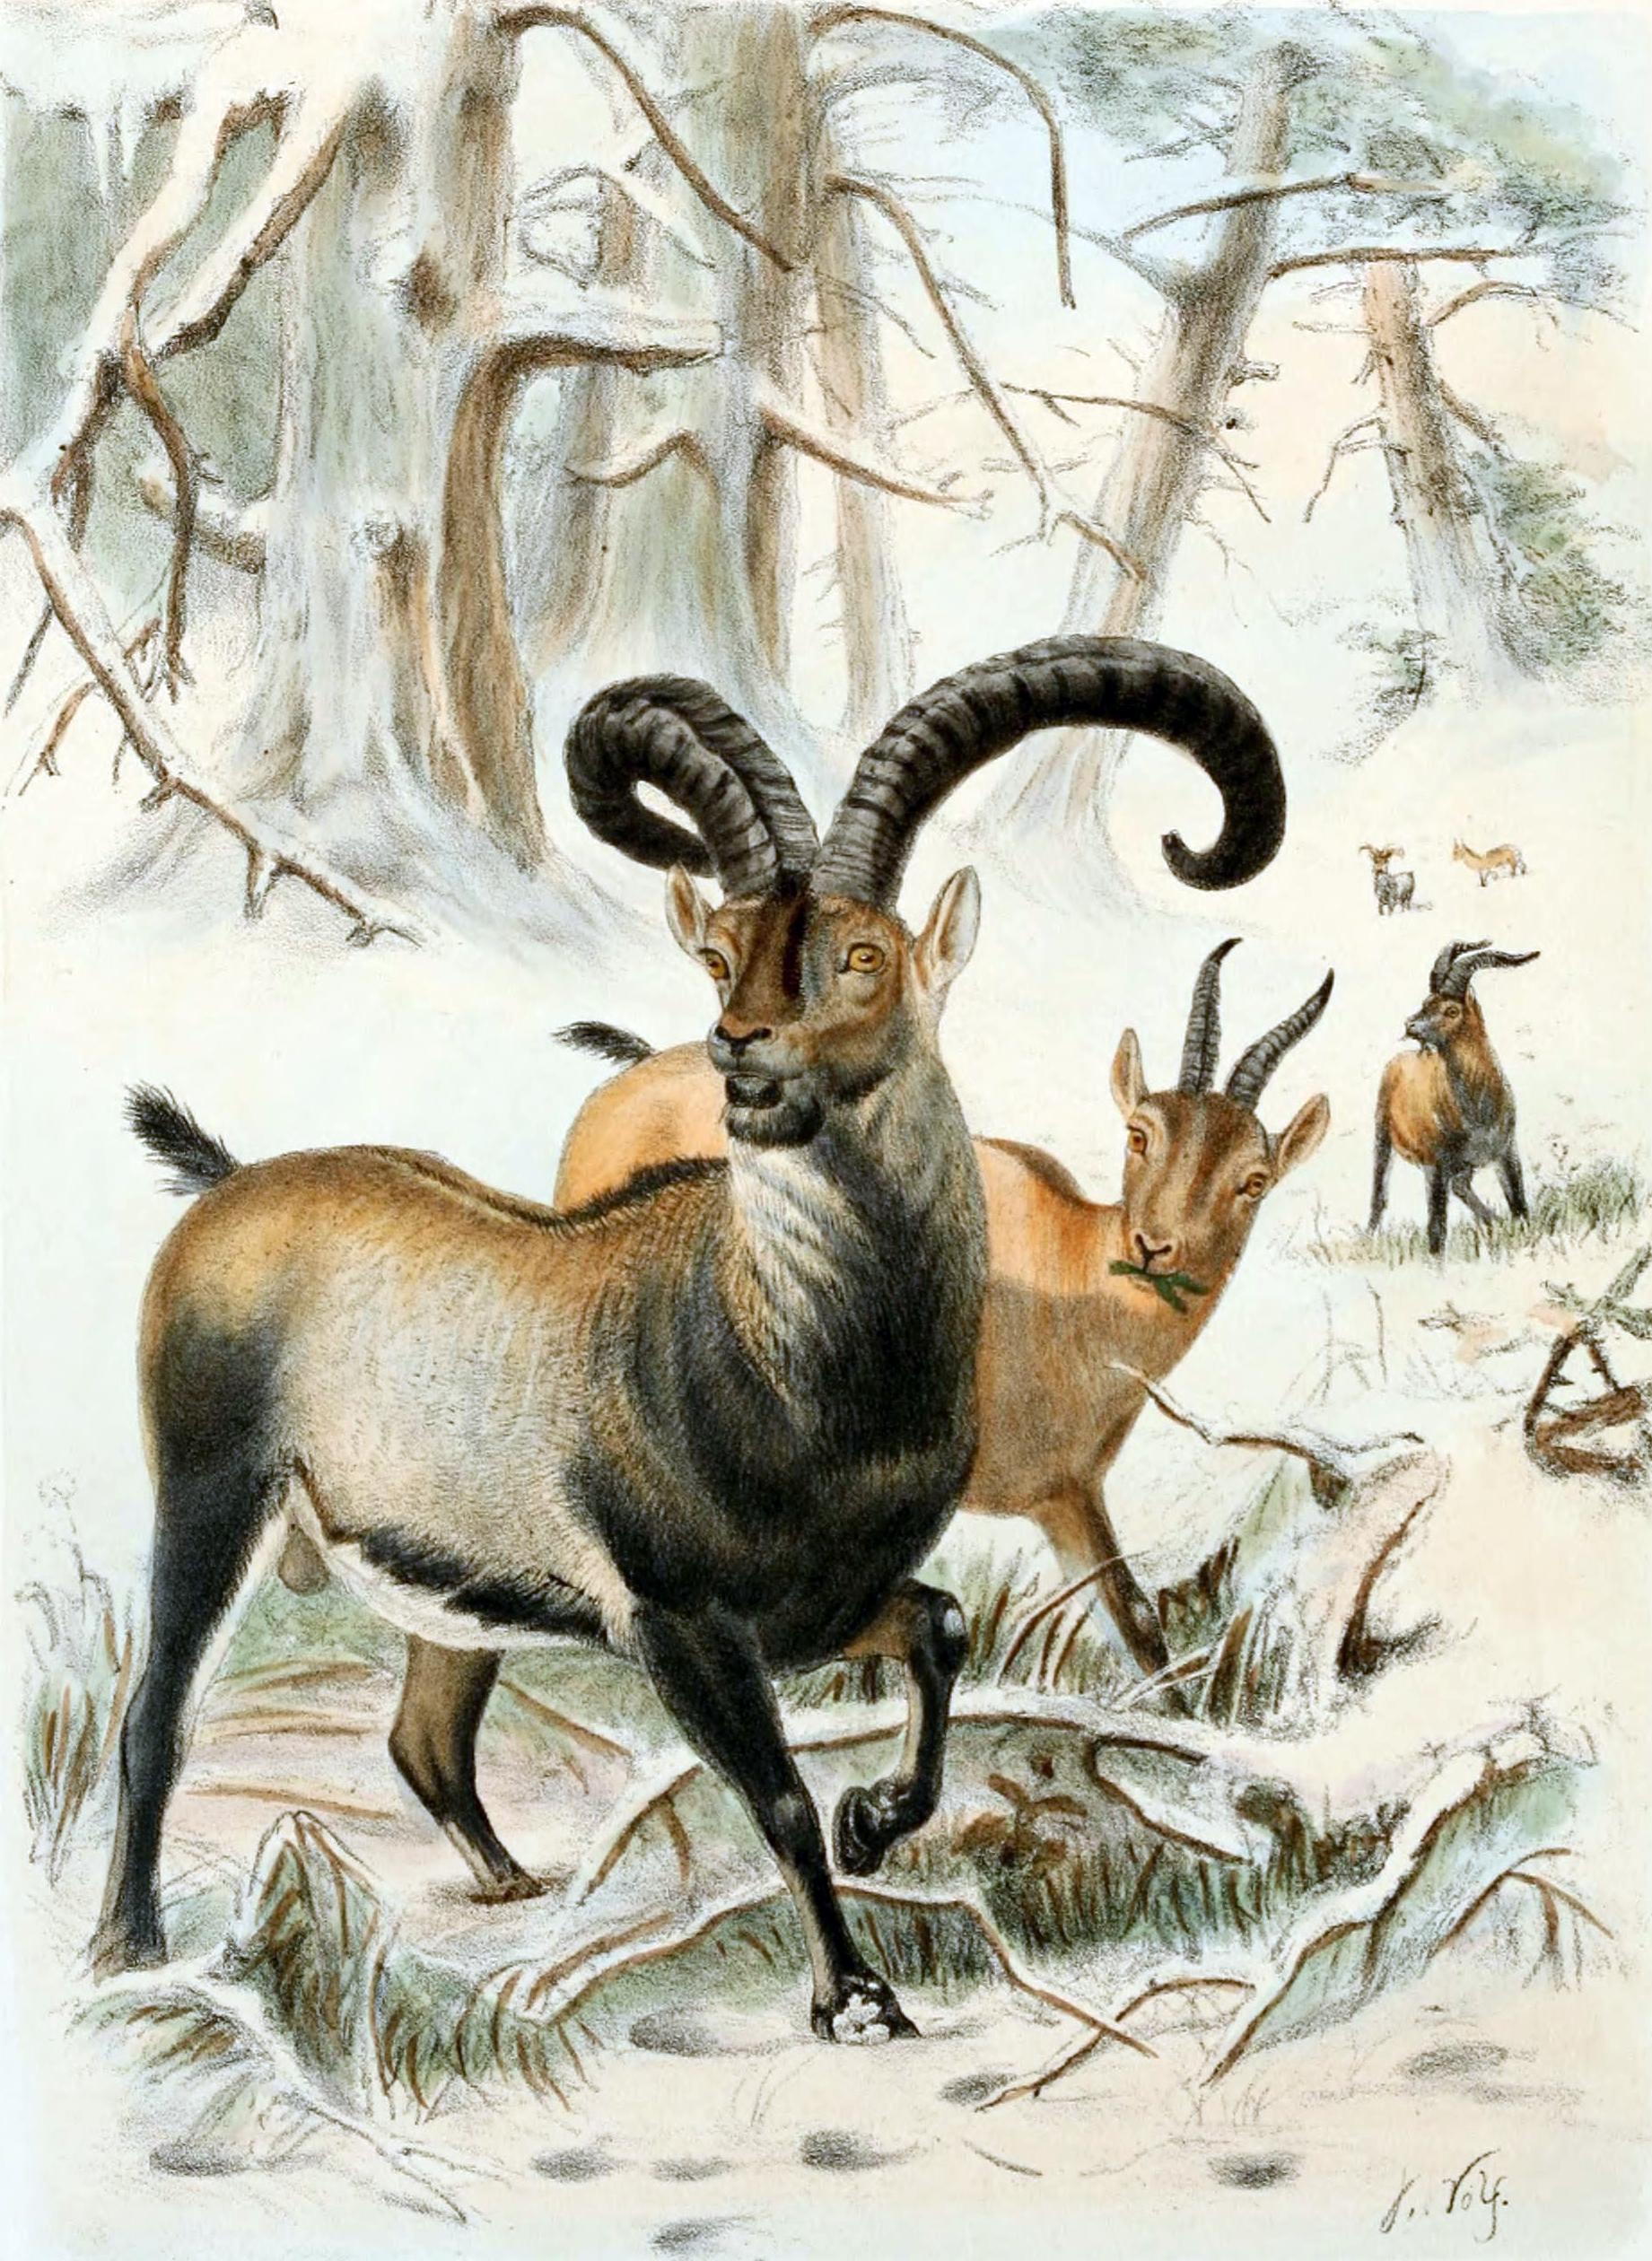 De-extinction - Wikipedia, the free encyclopedia